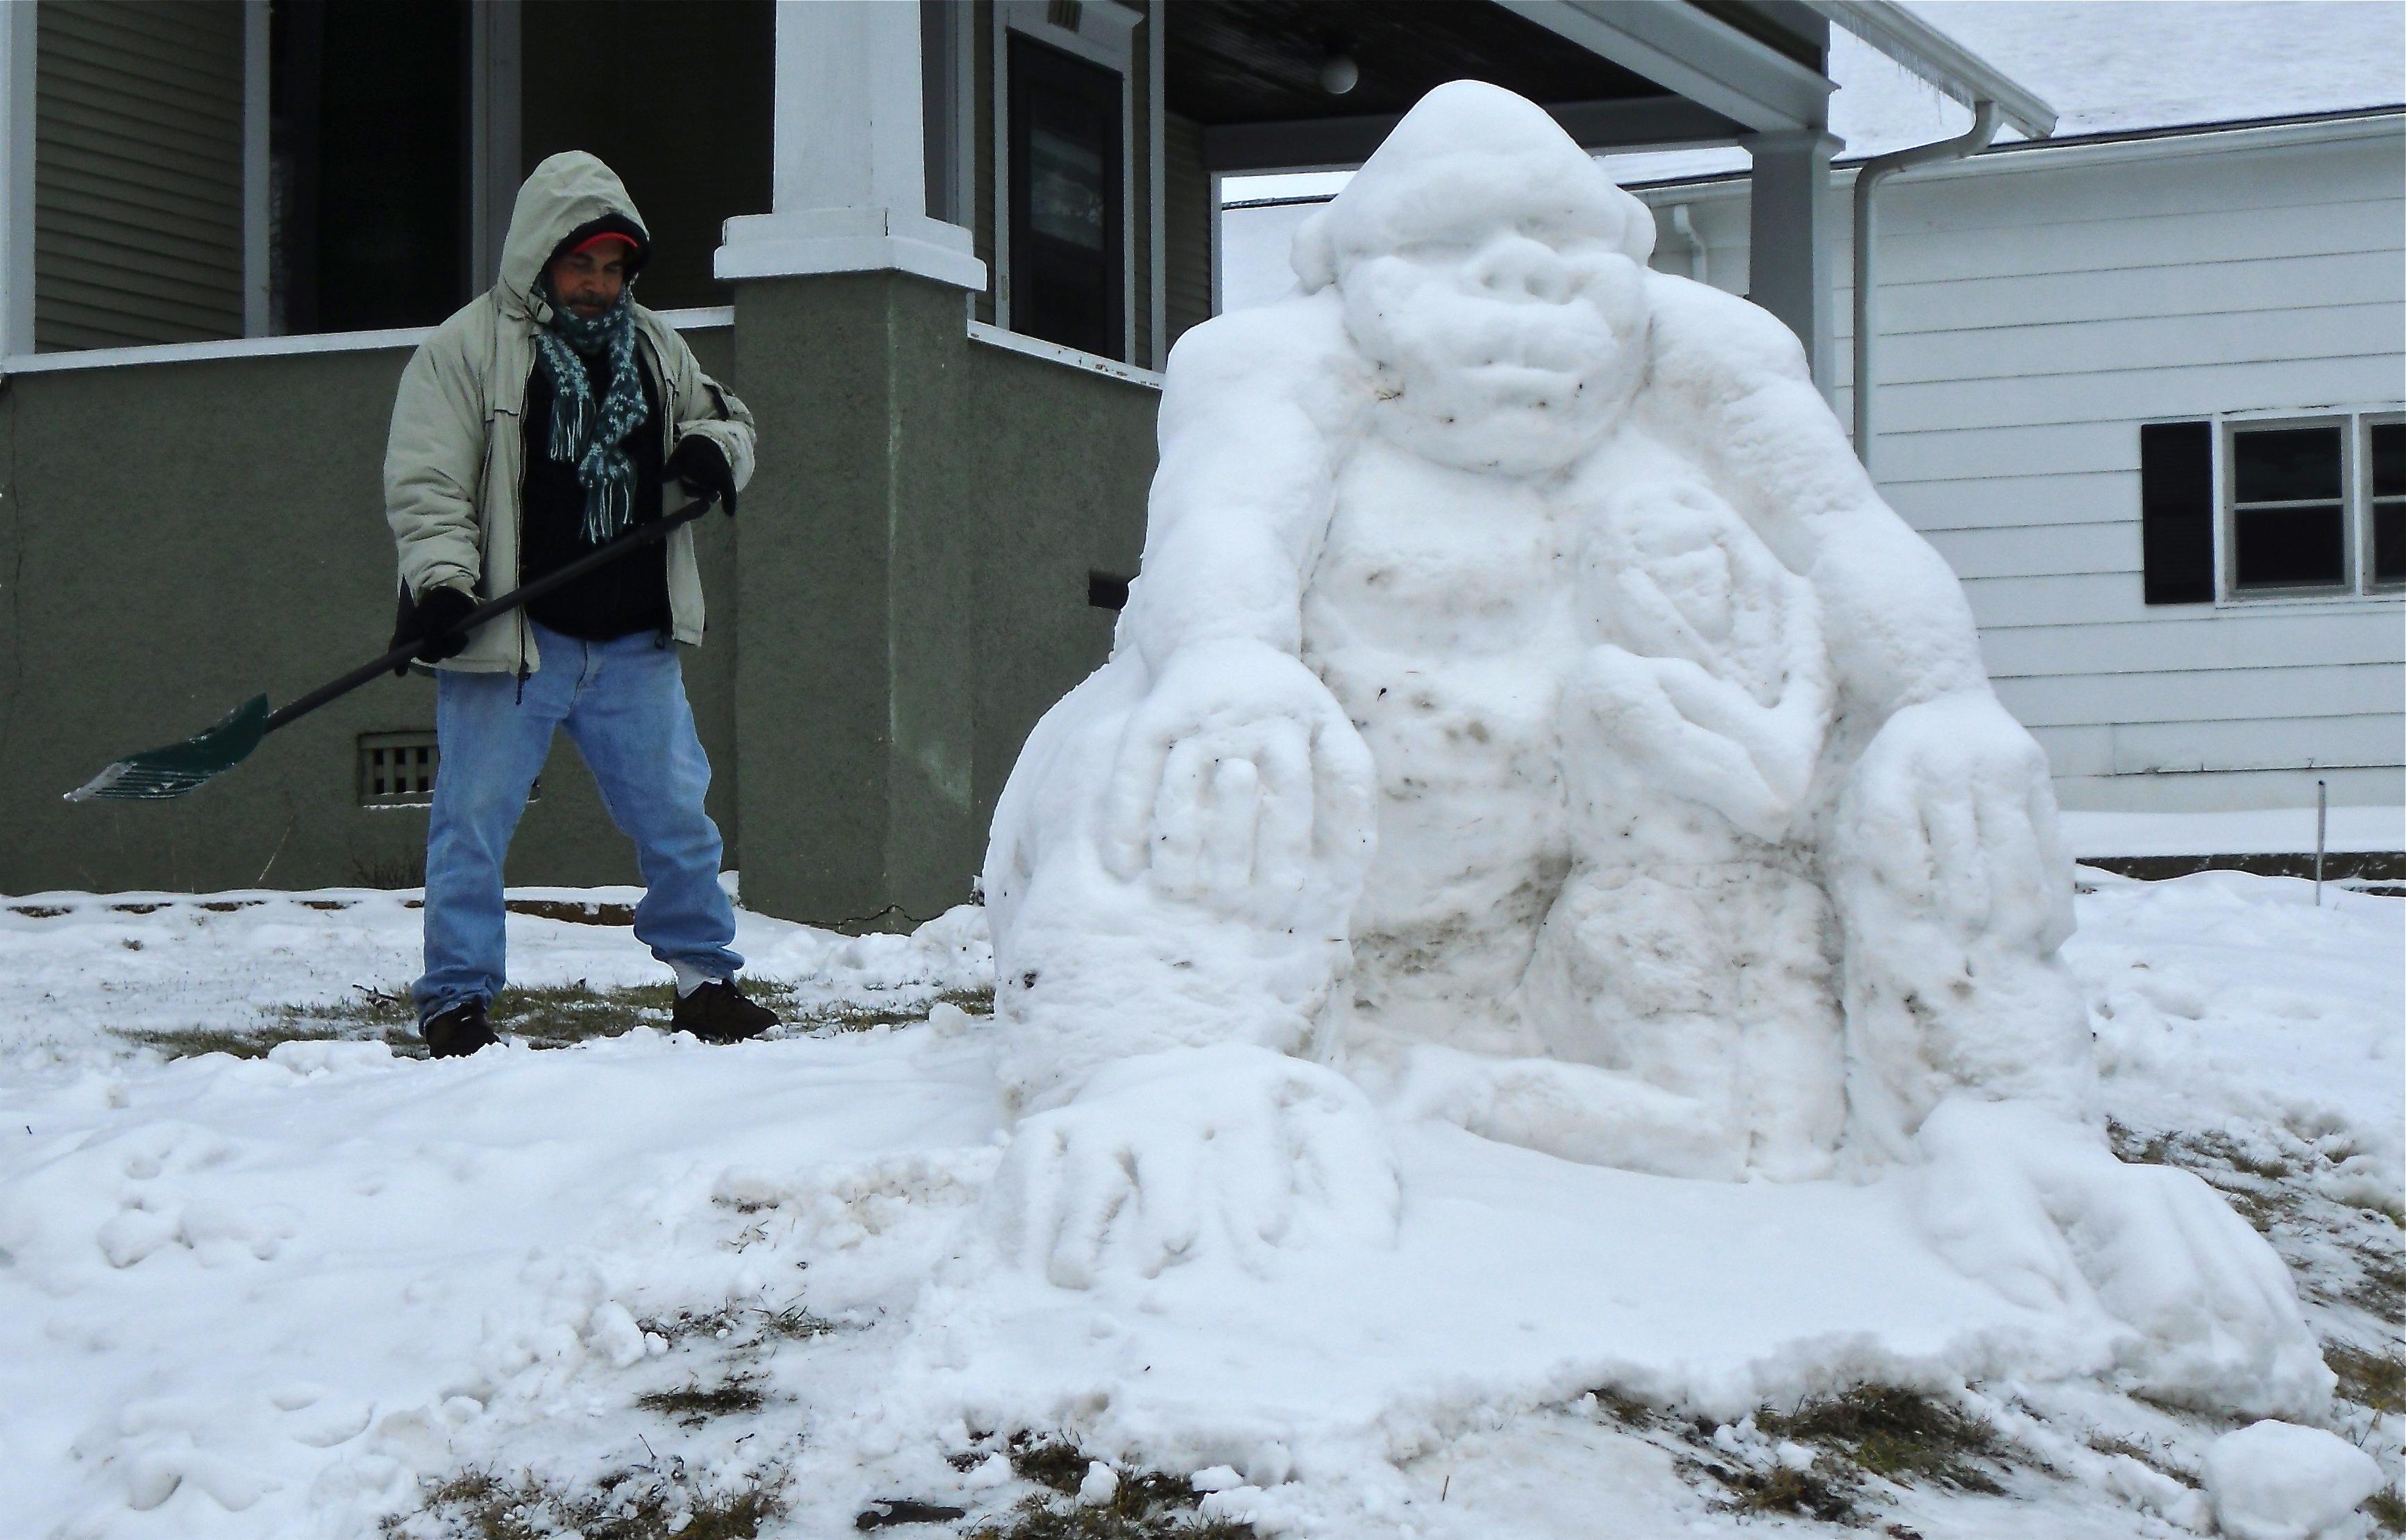 animal snow sculptures - photo #9